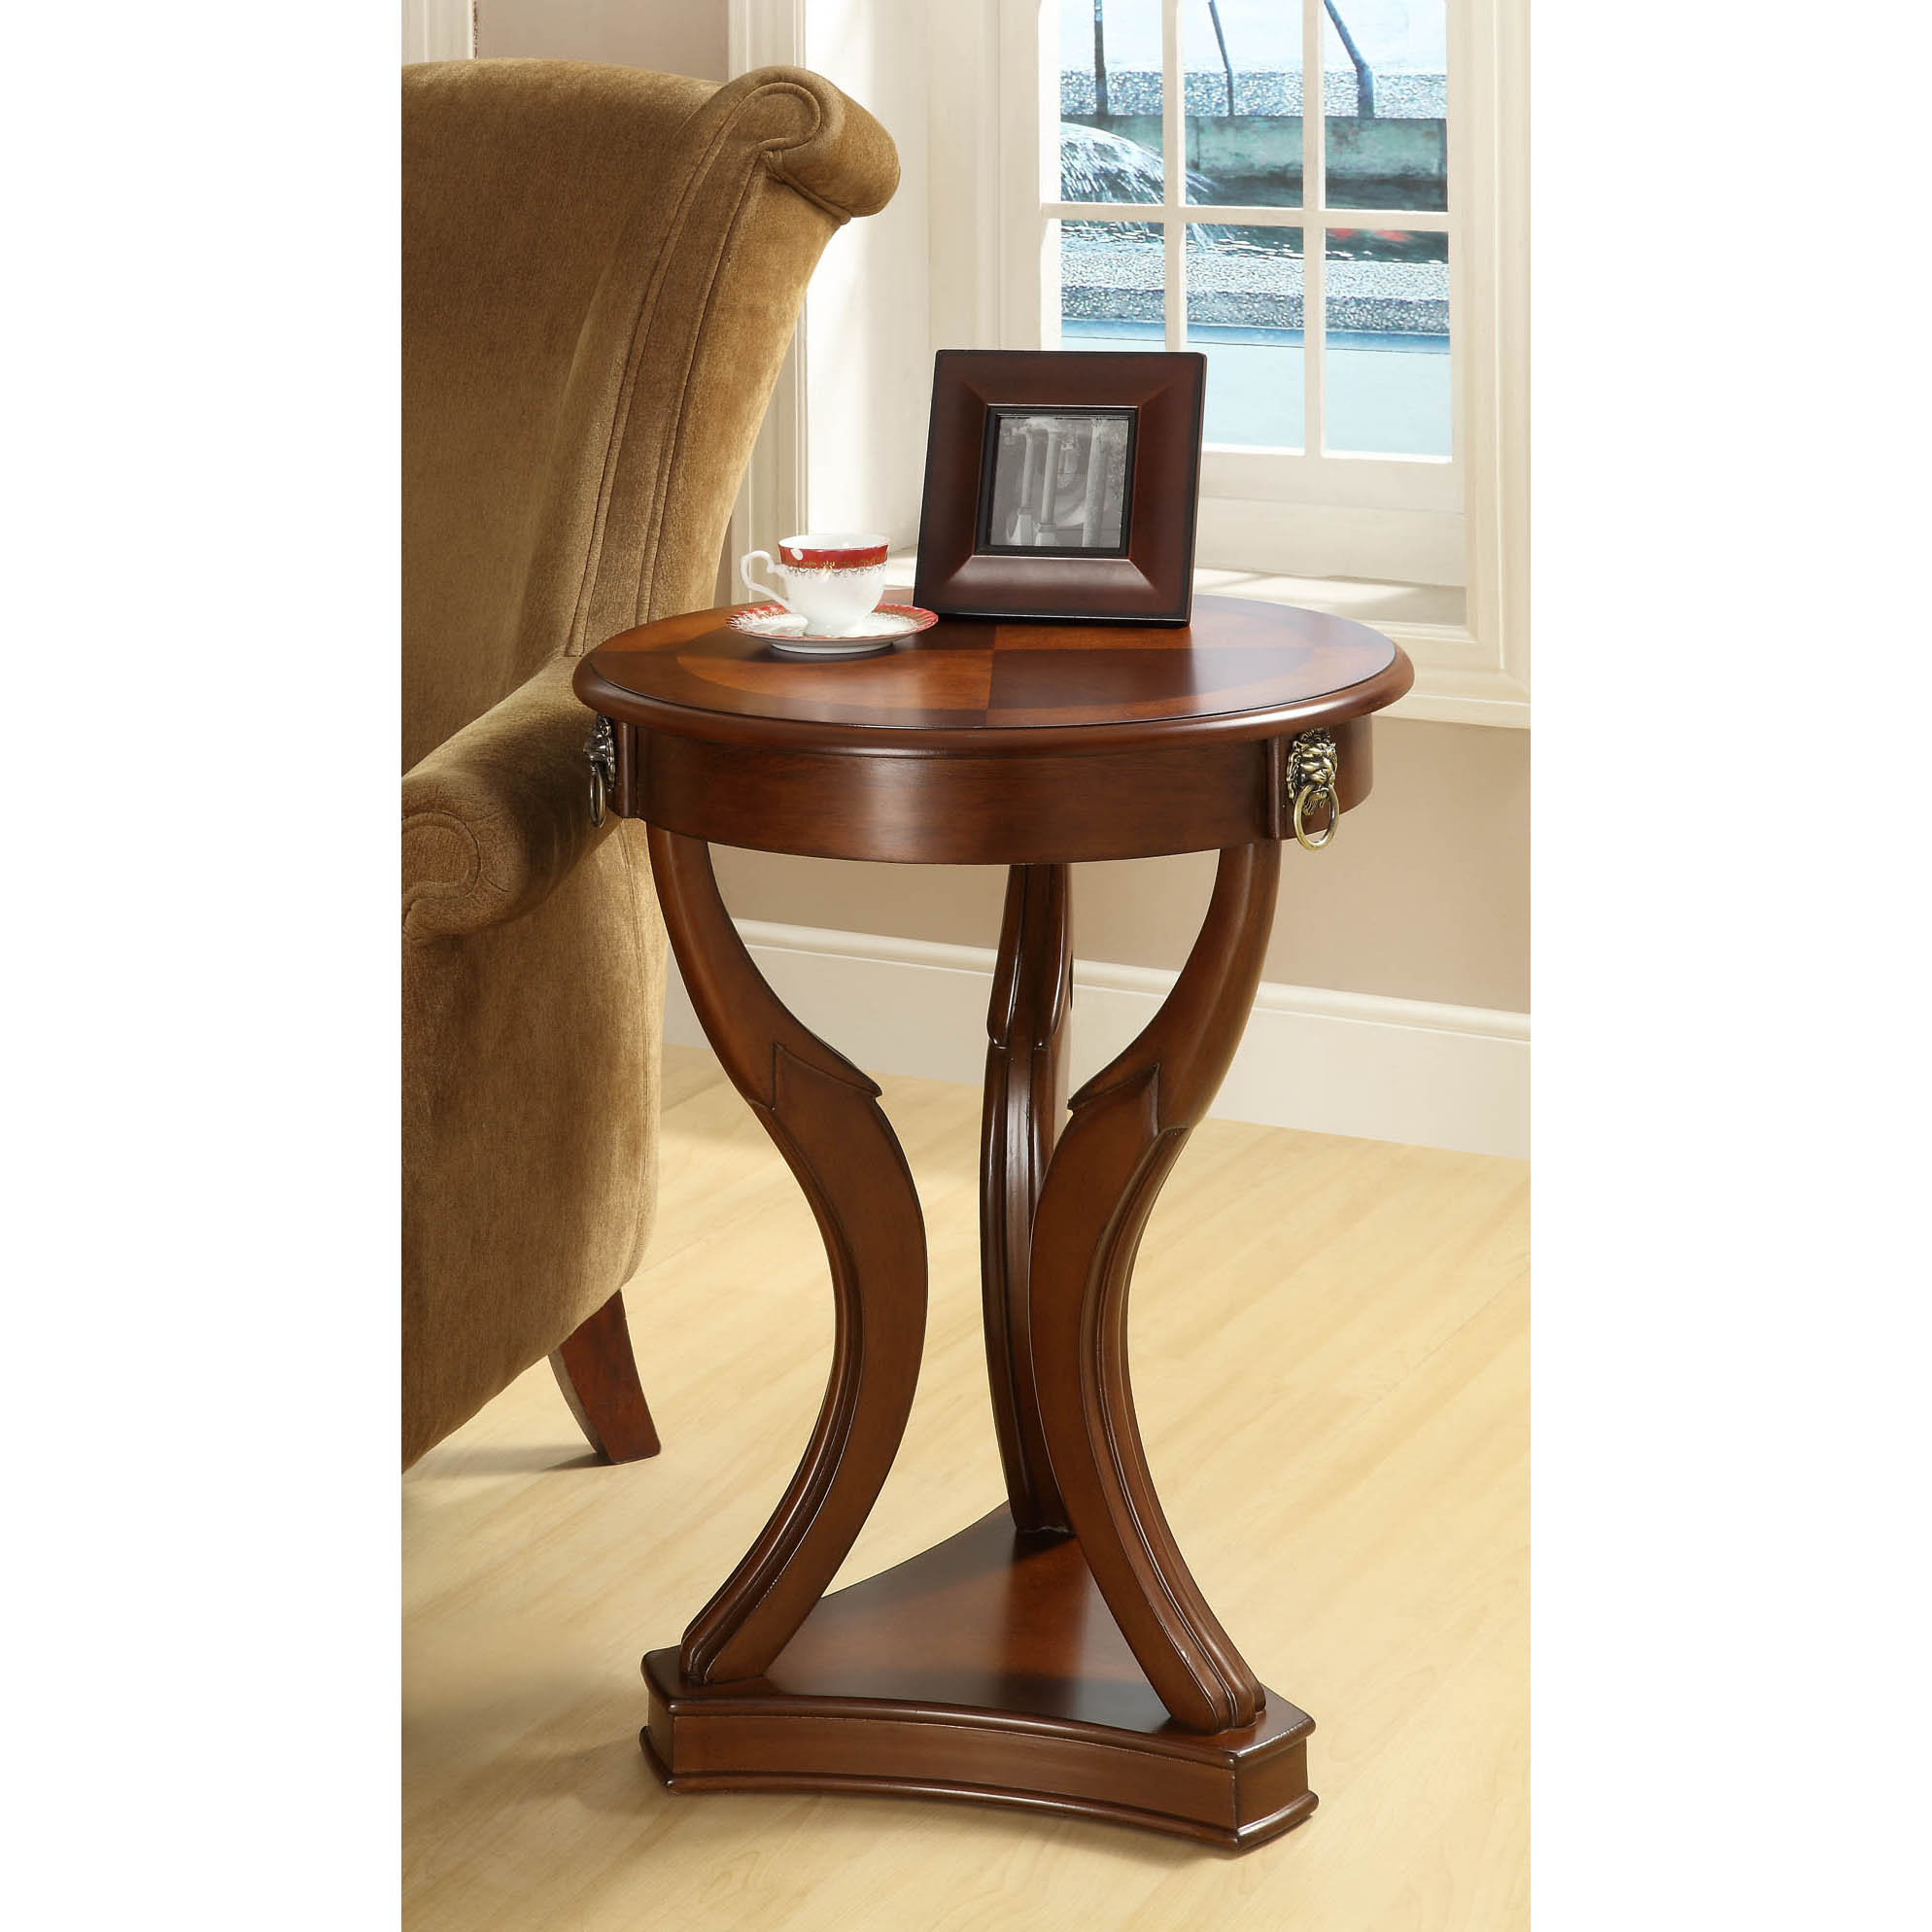 Medium Brown Birch Veneer 20-inch Accent Table